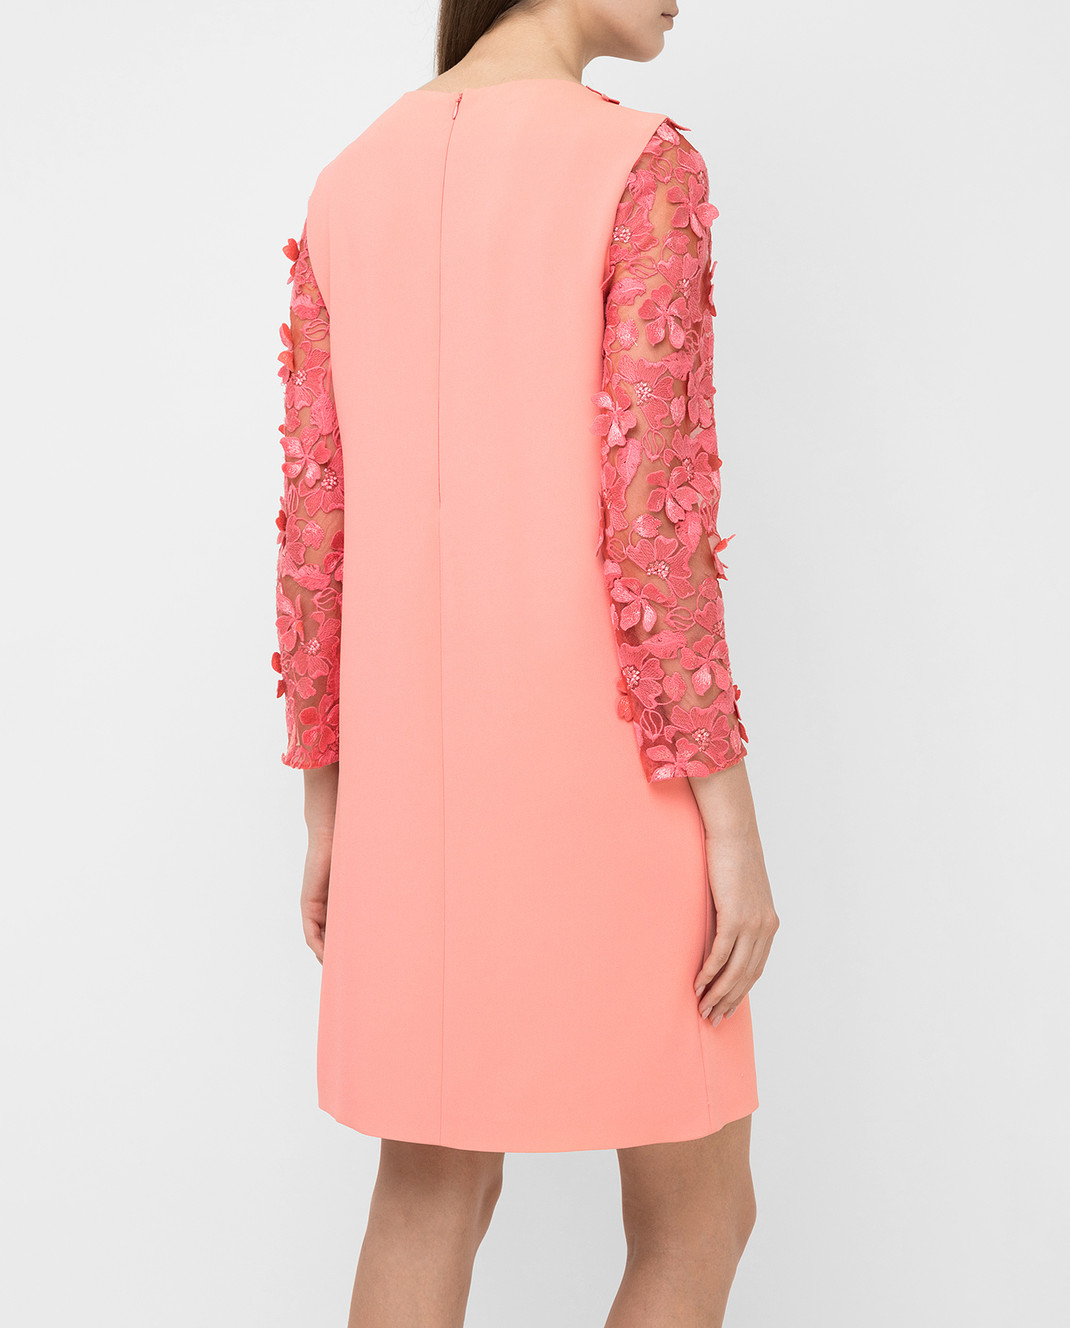 Giamba Коралловое платье PG5270 изображение 4